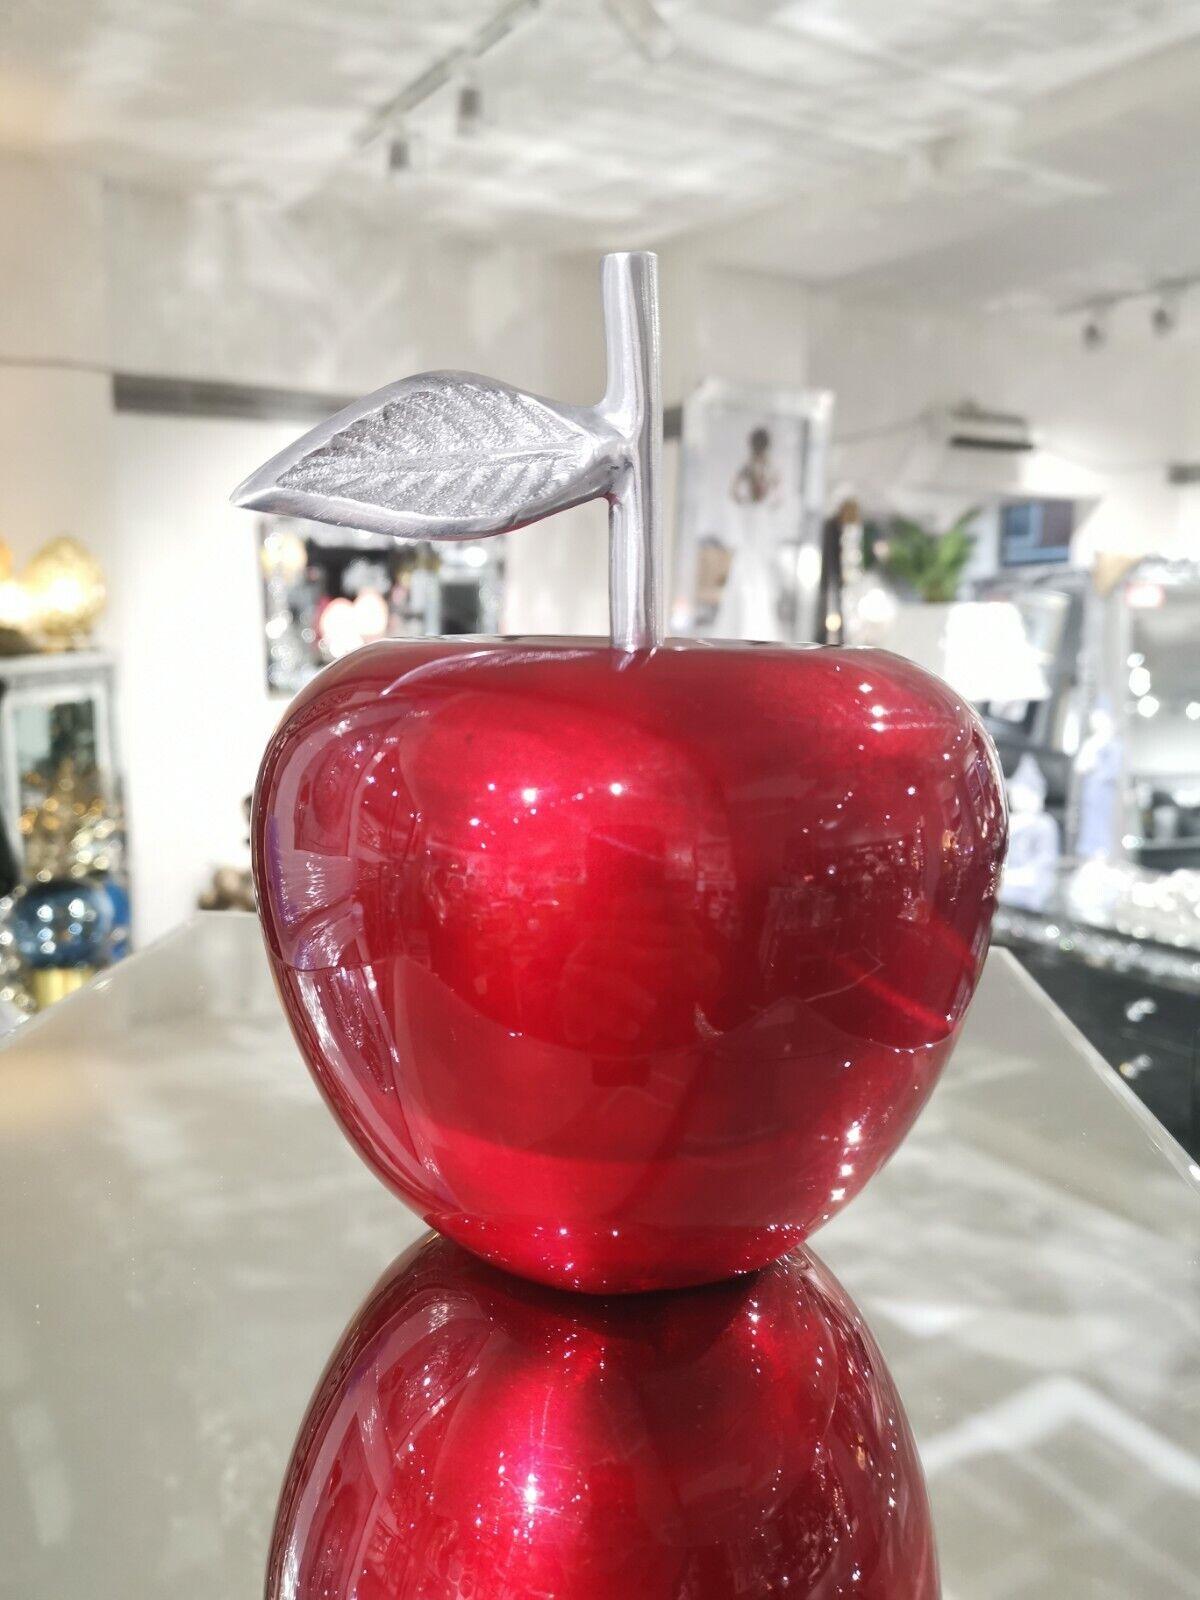 Large Aluminium Red Whole Apple Table Decor, Ornament, Statement Piece